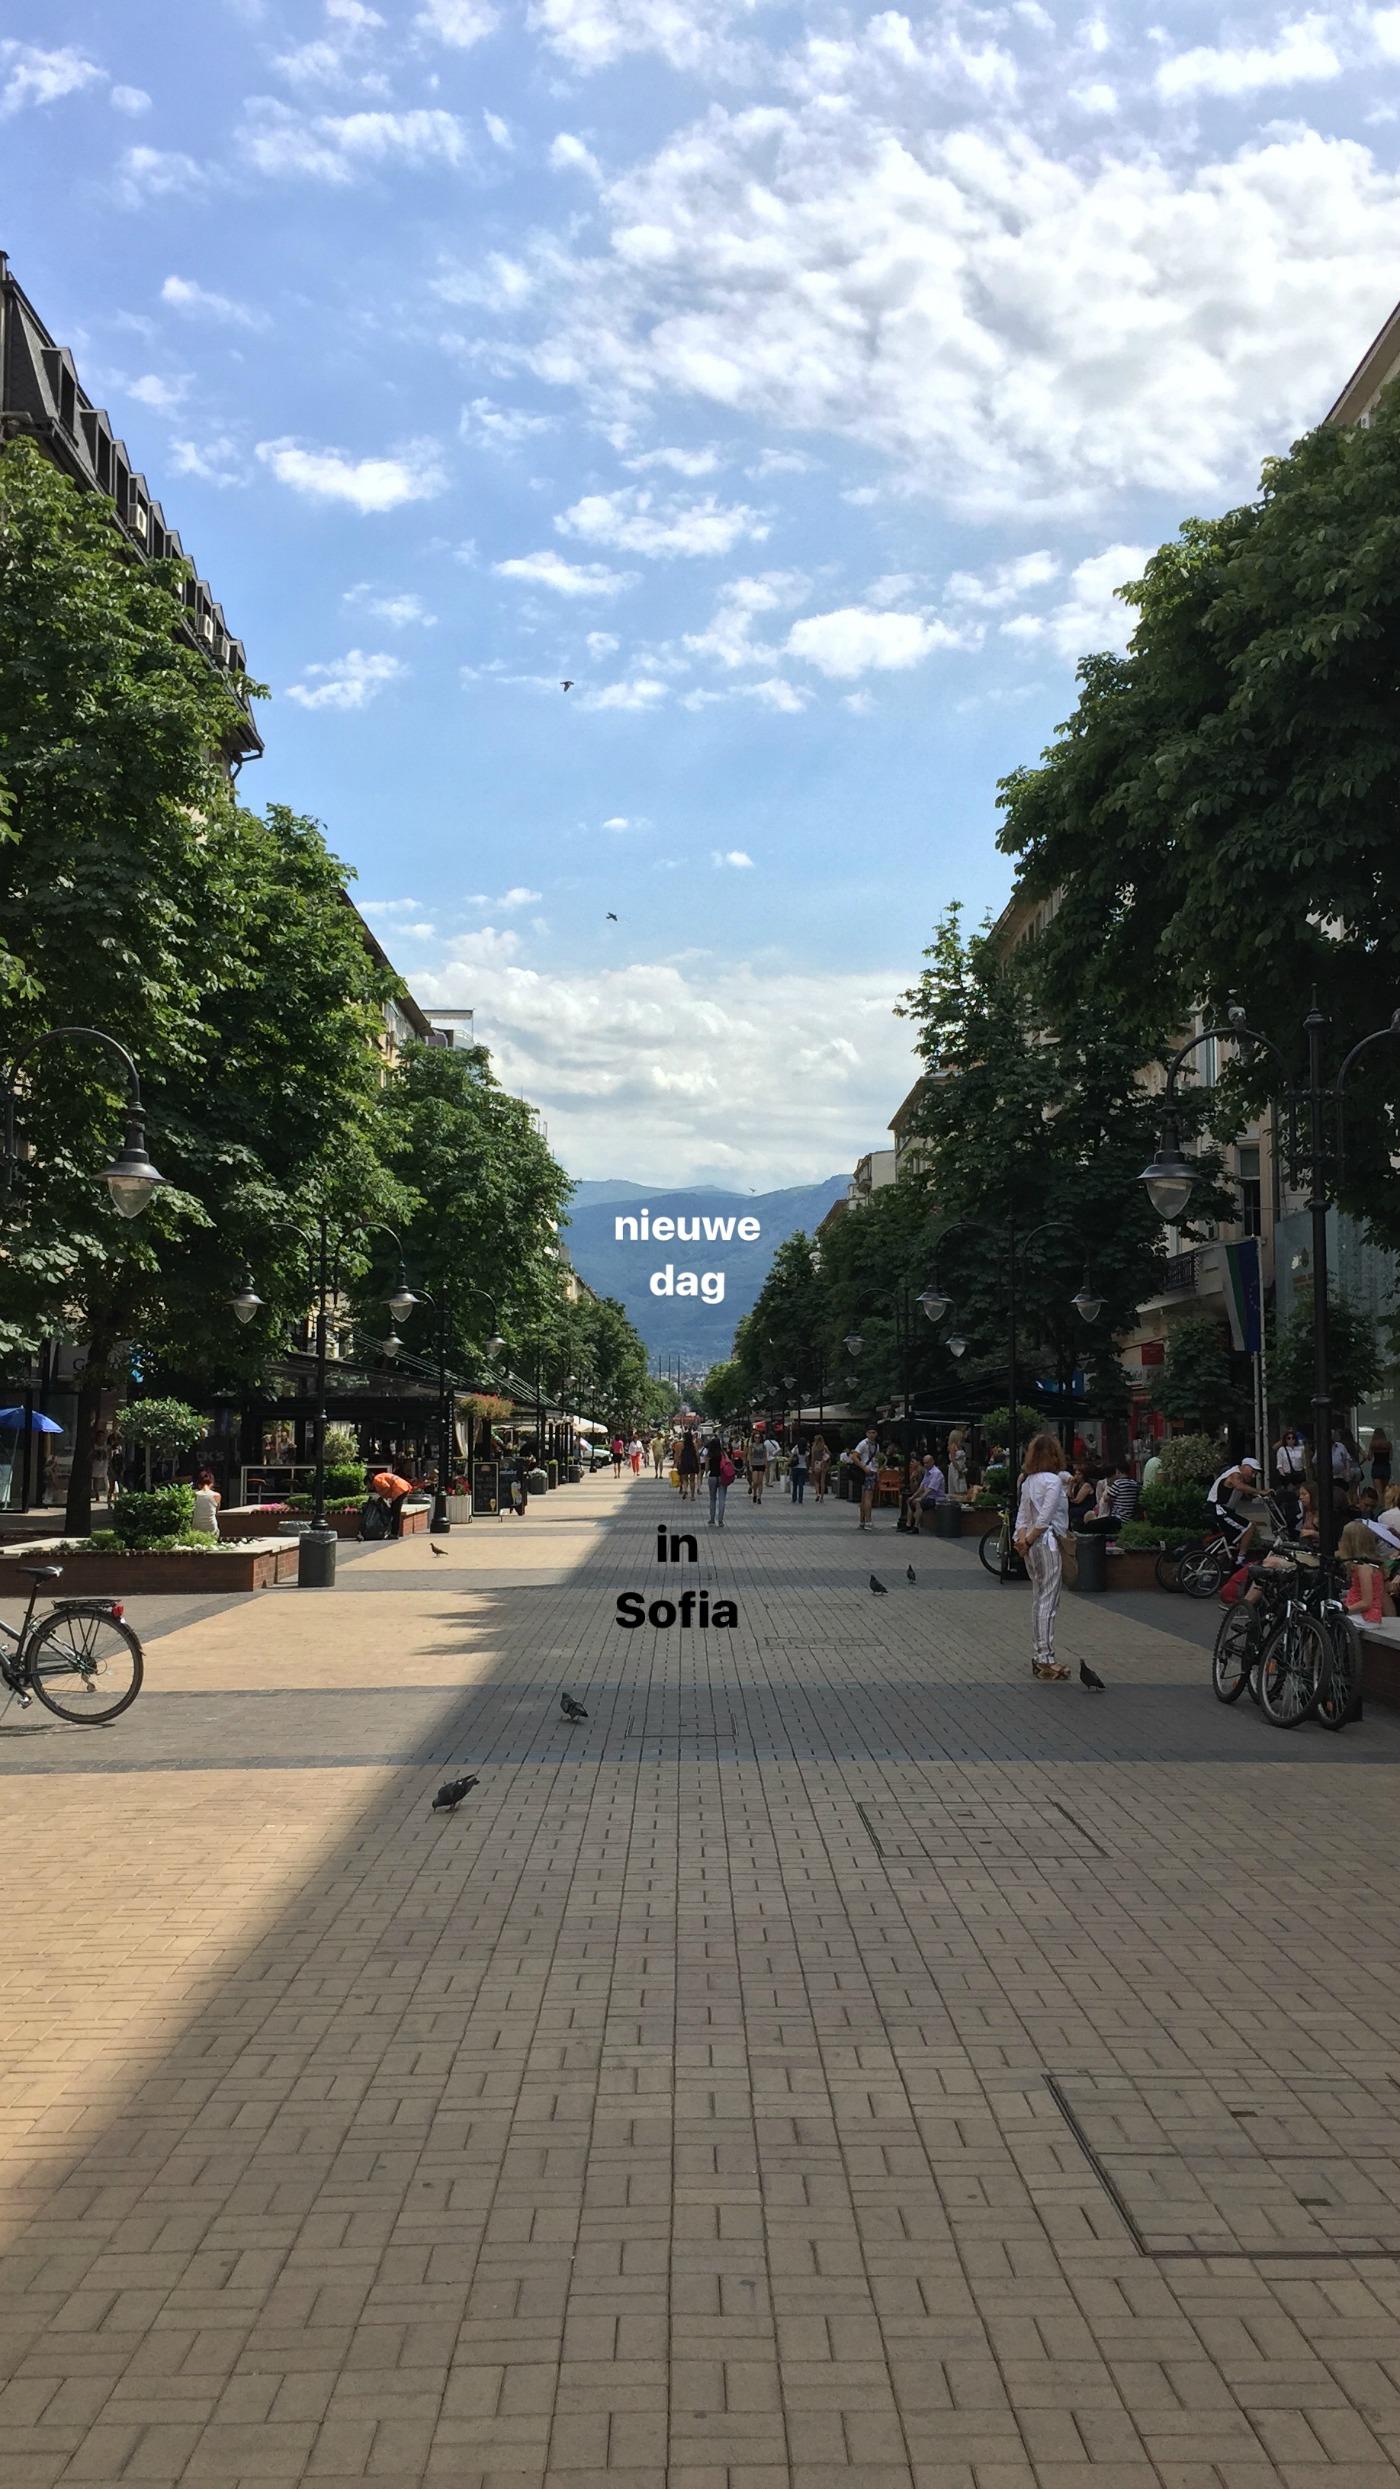 Sofia hotspots